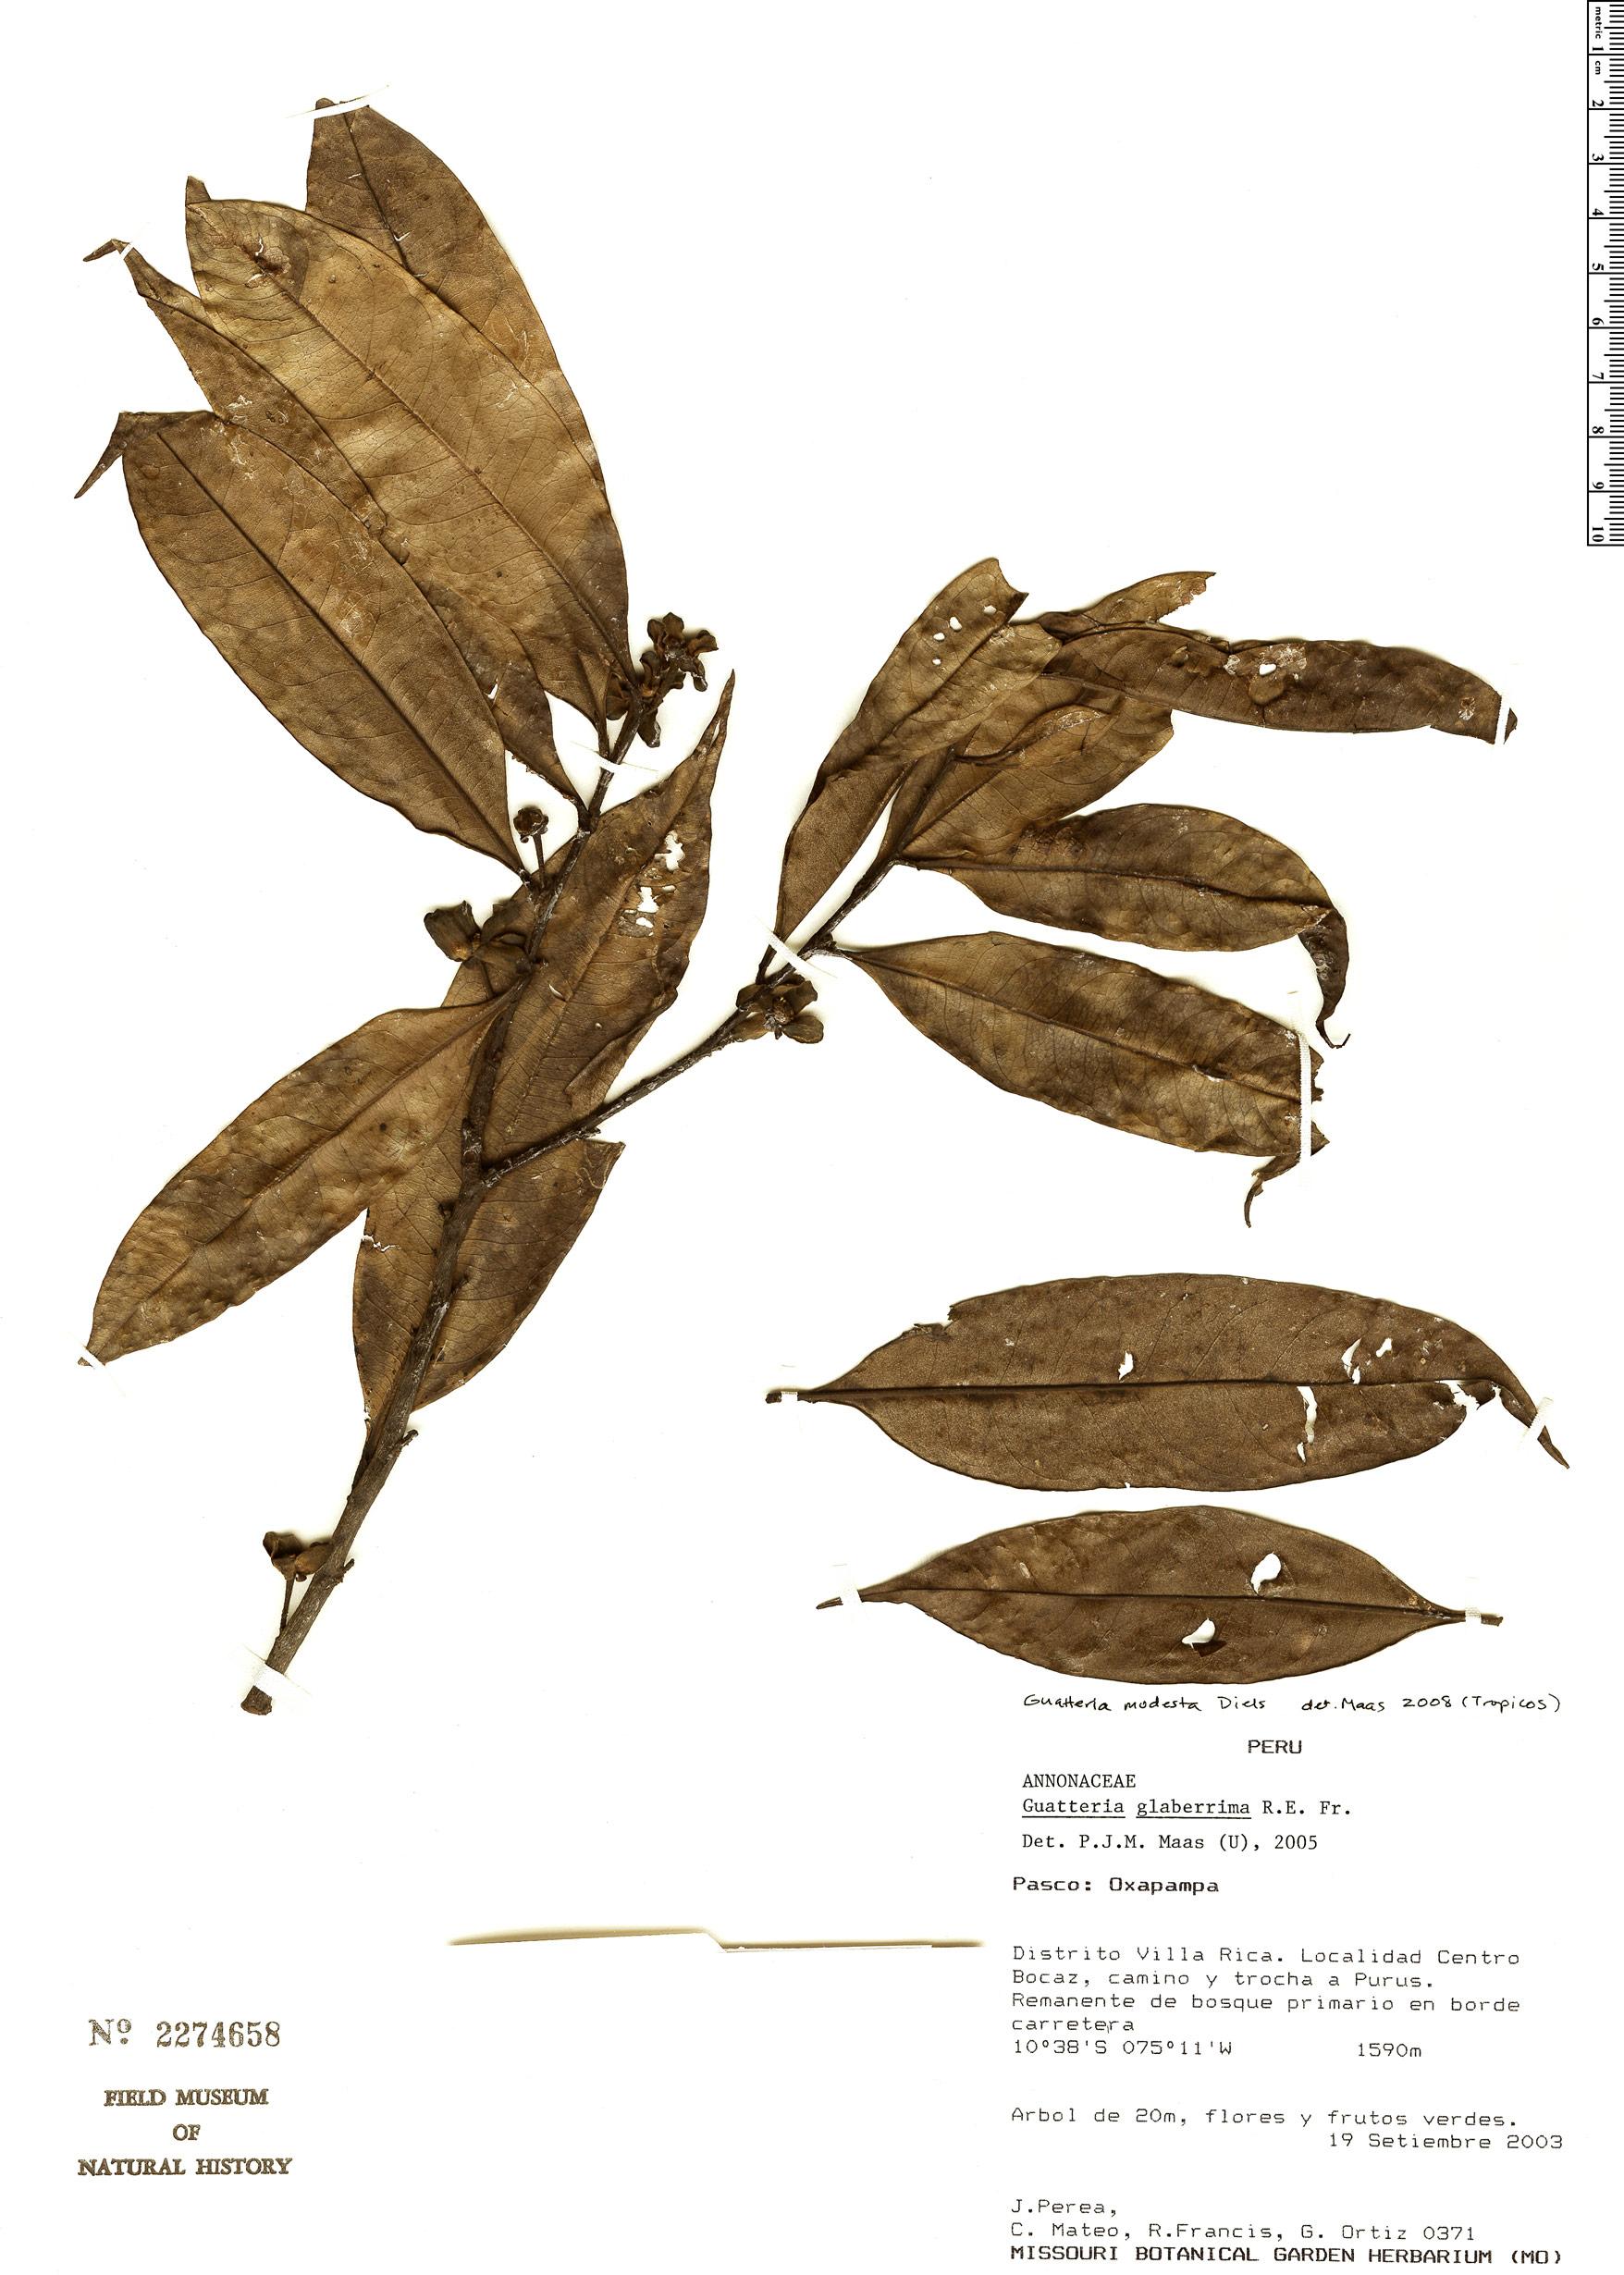 Specimen: Guatteria modesta